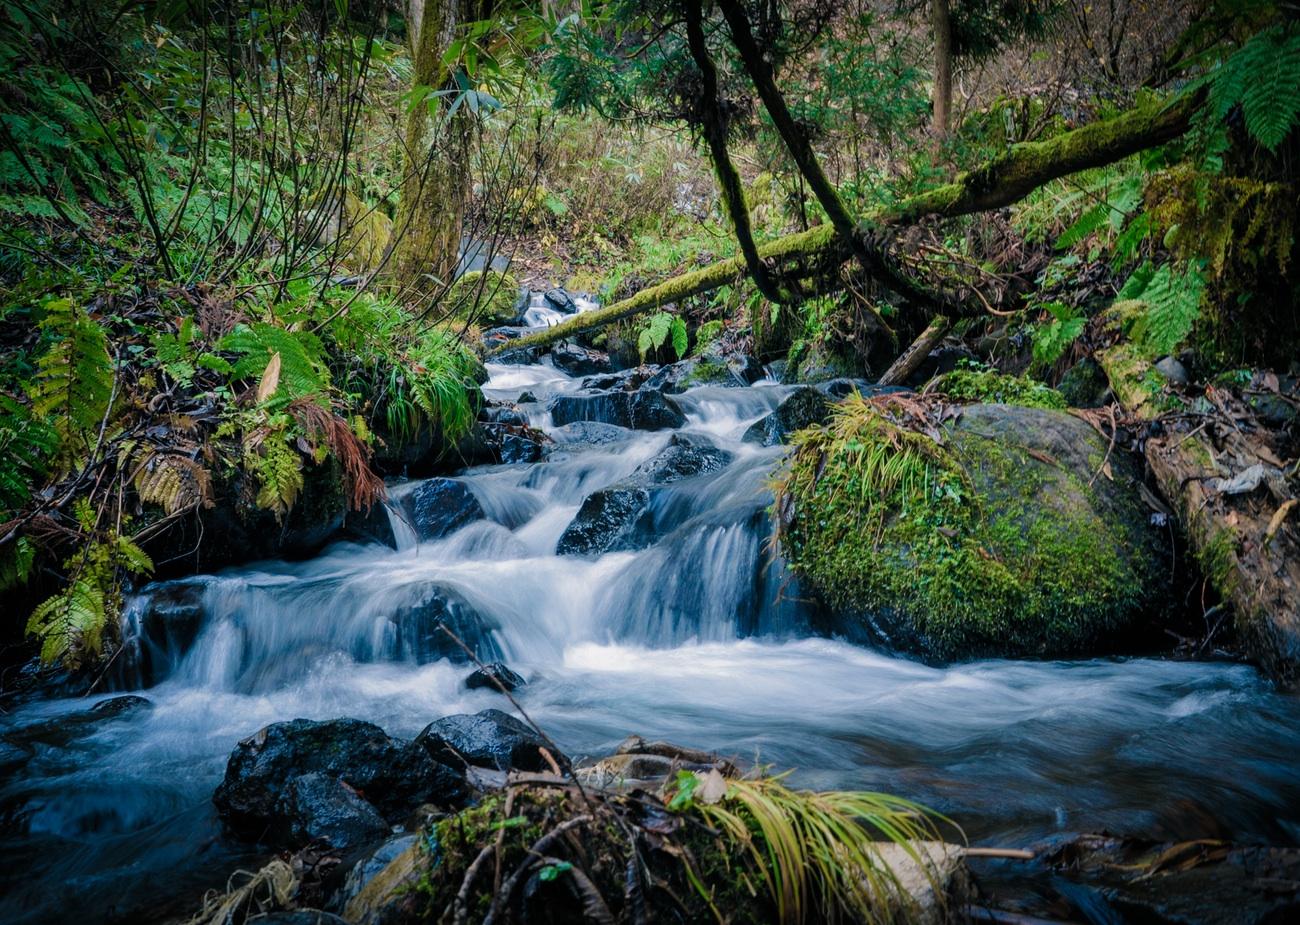 steve austin found God in a waterfall